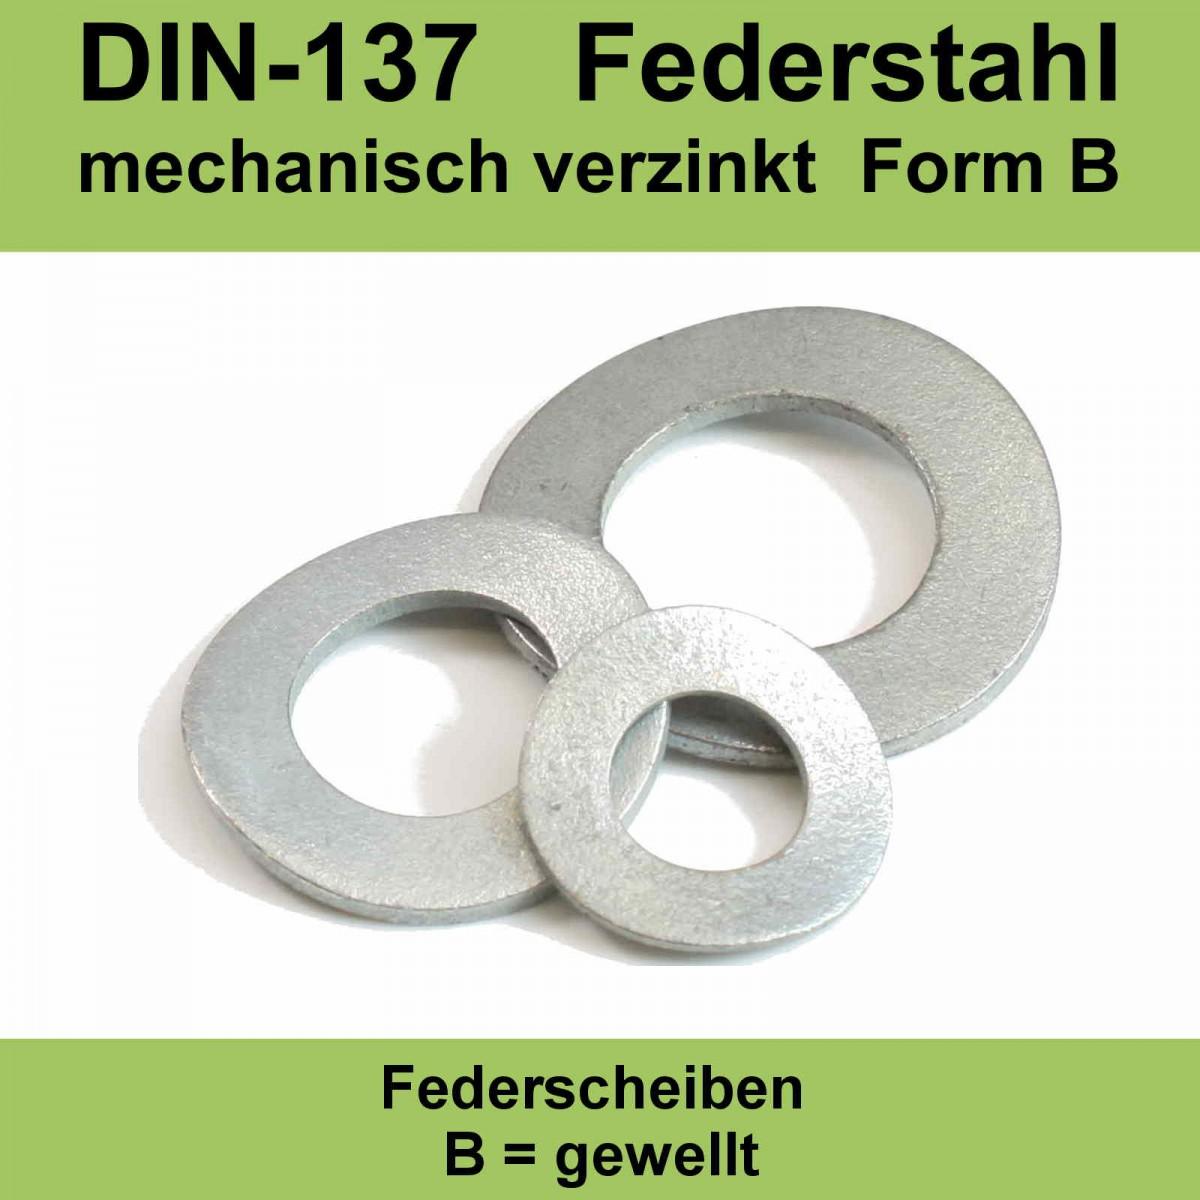 10 Stk Federscheibe B 06 DIN 137